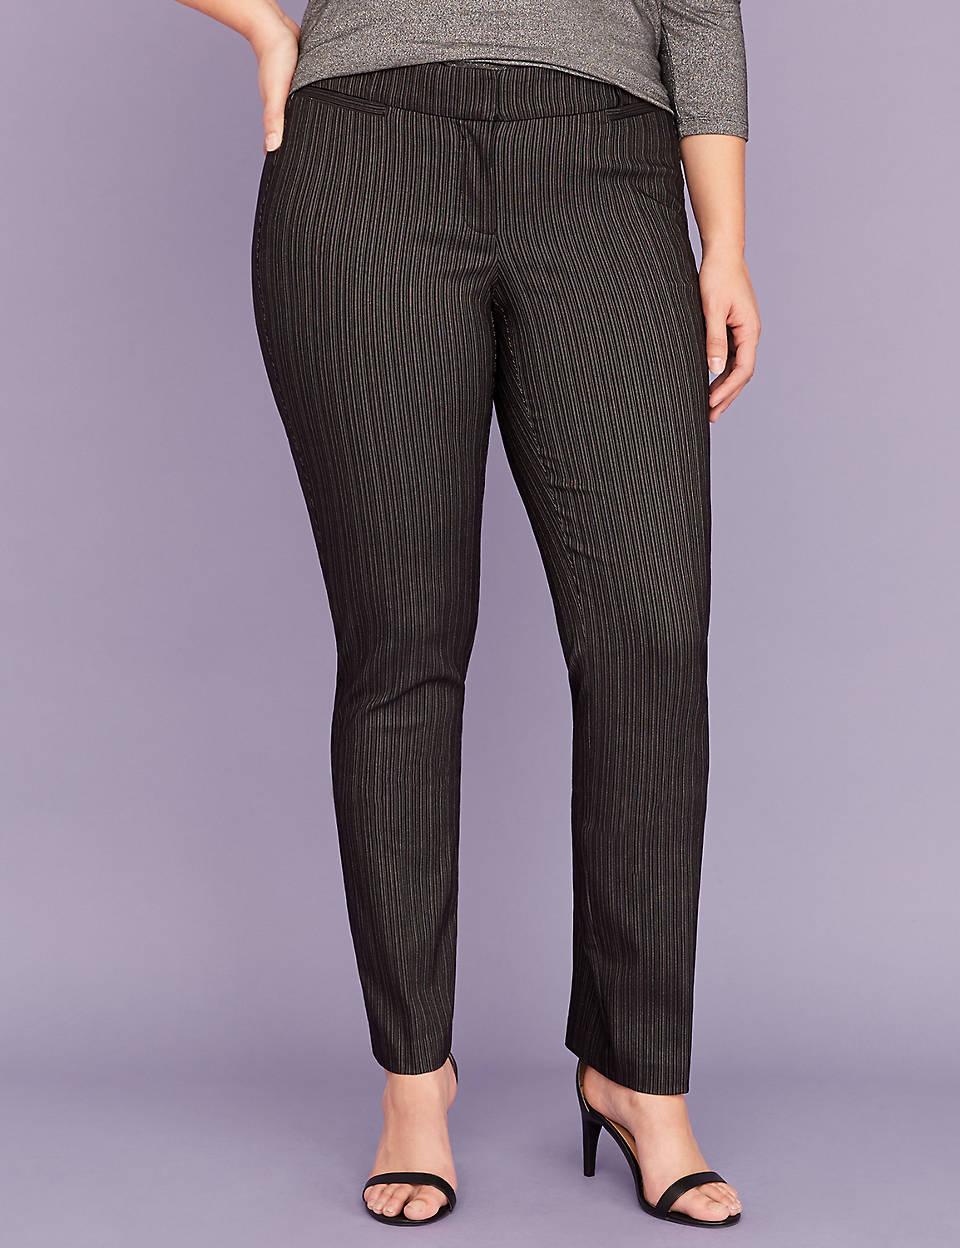 17c4a5bf829 Allie Sexy Stretch Straight Leg Pant - Black Pinstripe